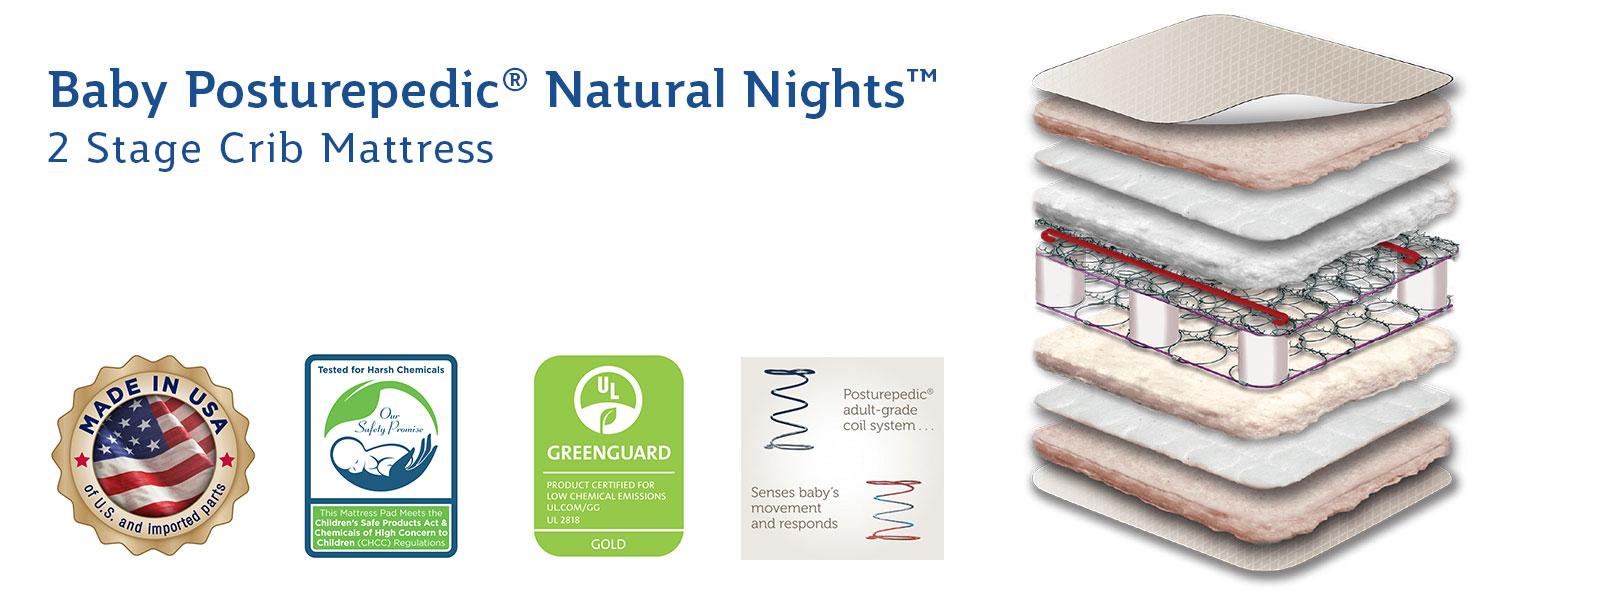 Infant Crib Mattress Posturepedic Natural Nights 2 Stage